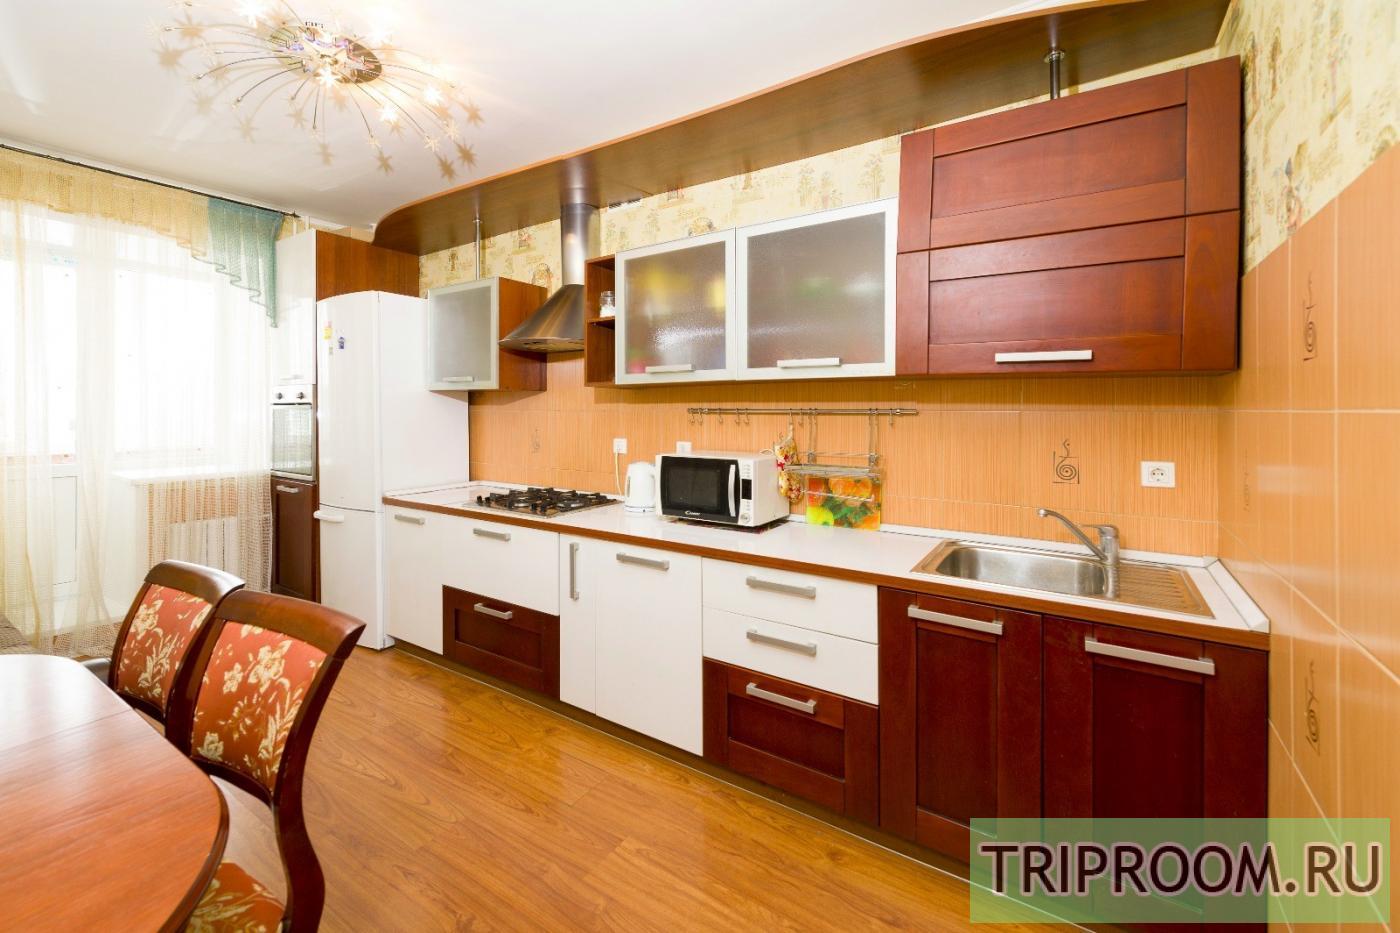 2-комнатная квартира посуточно (вариант № 2850), ул. Габдуллы Тукая улица, фото № 7